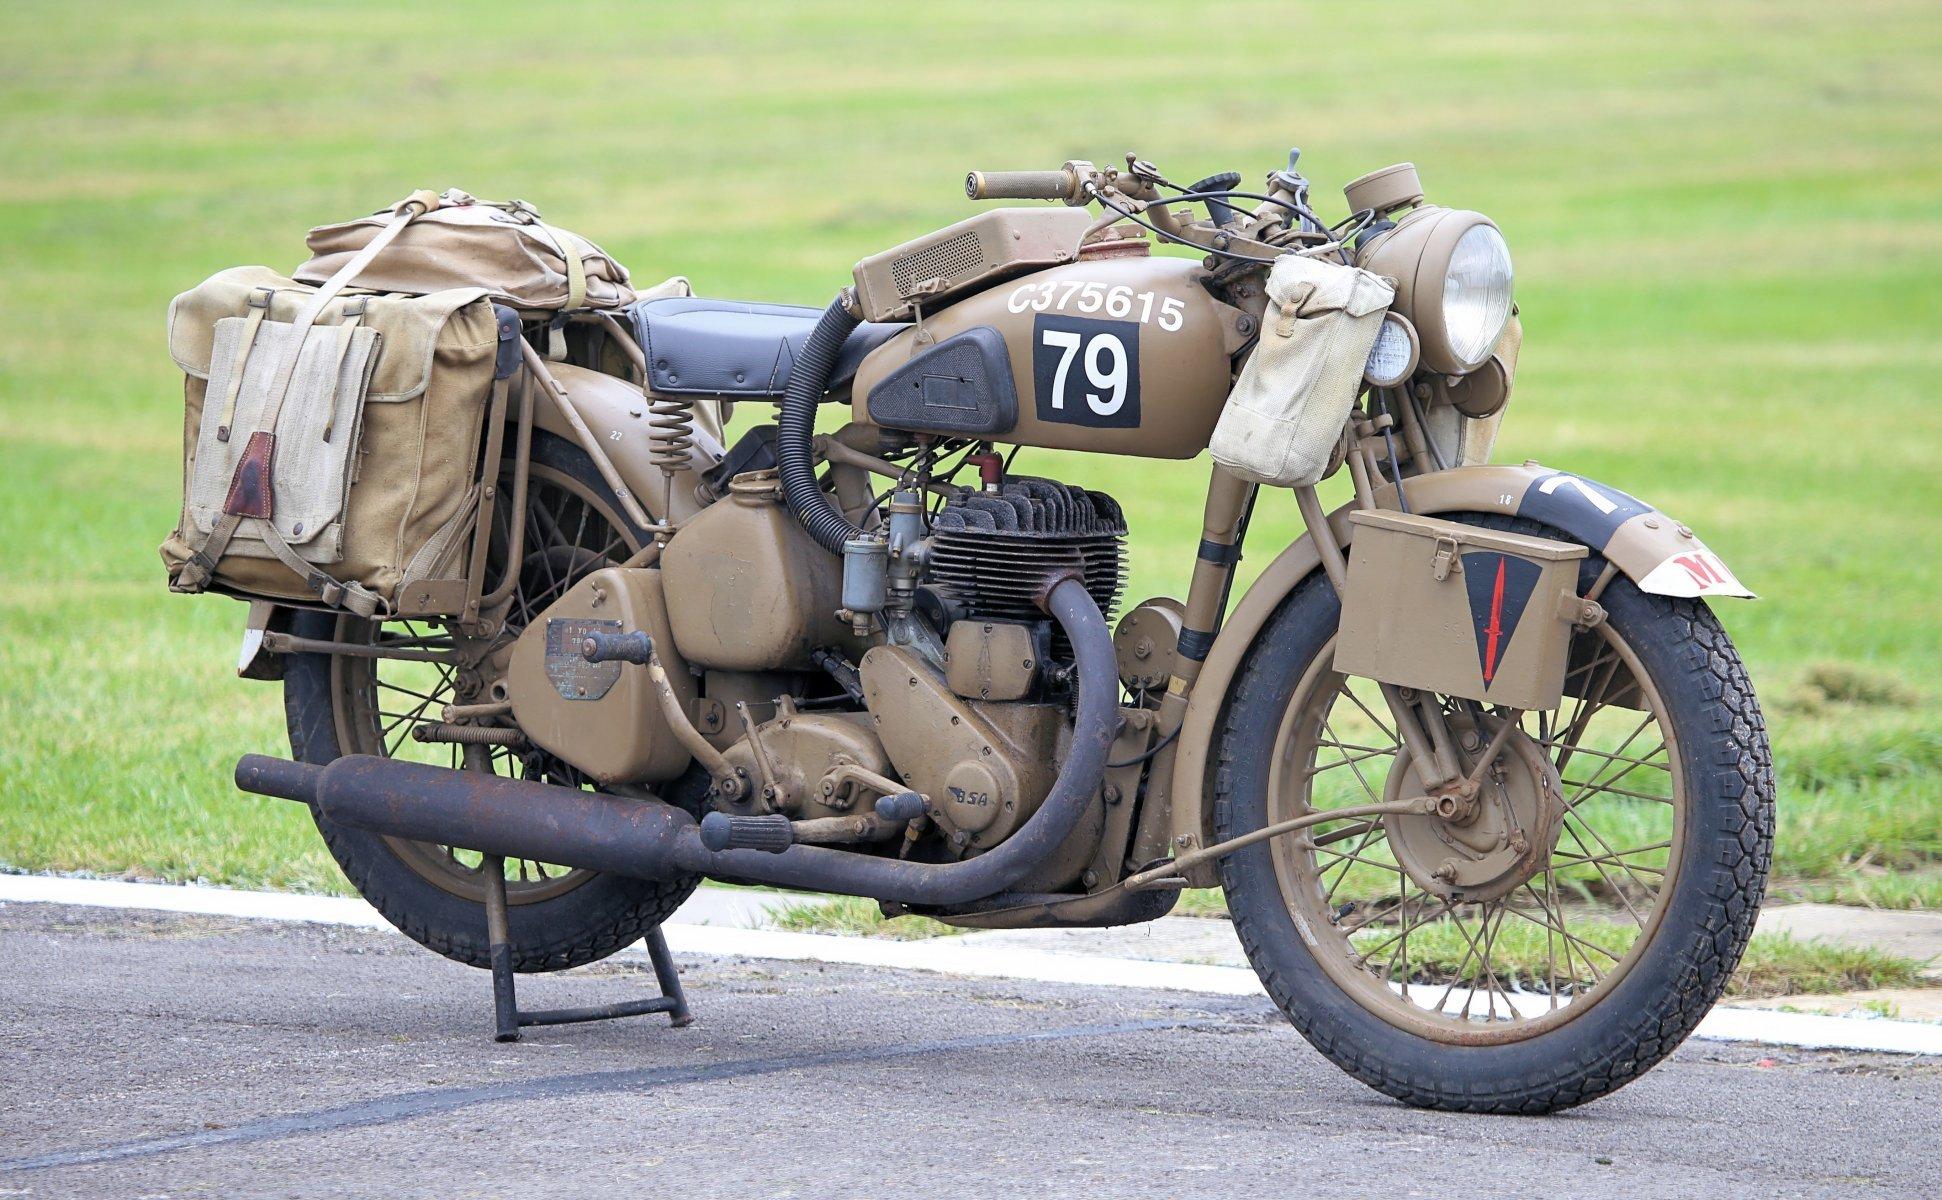 military bike times second world war HD wallpaper 1942x1200